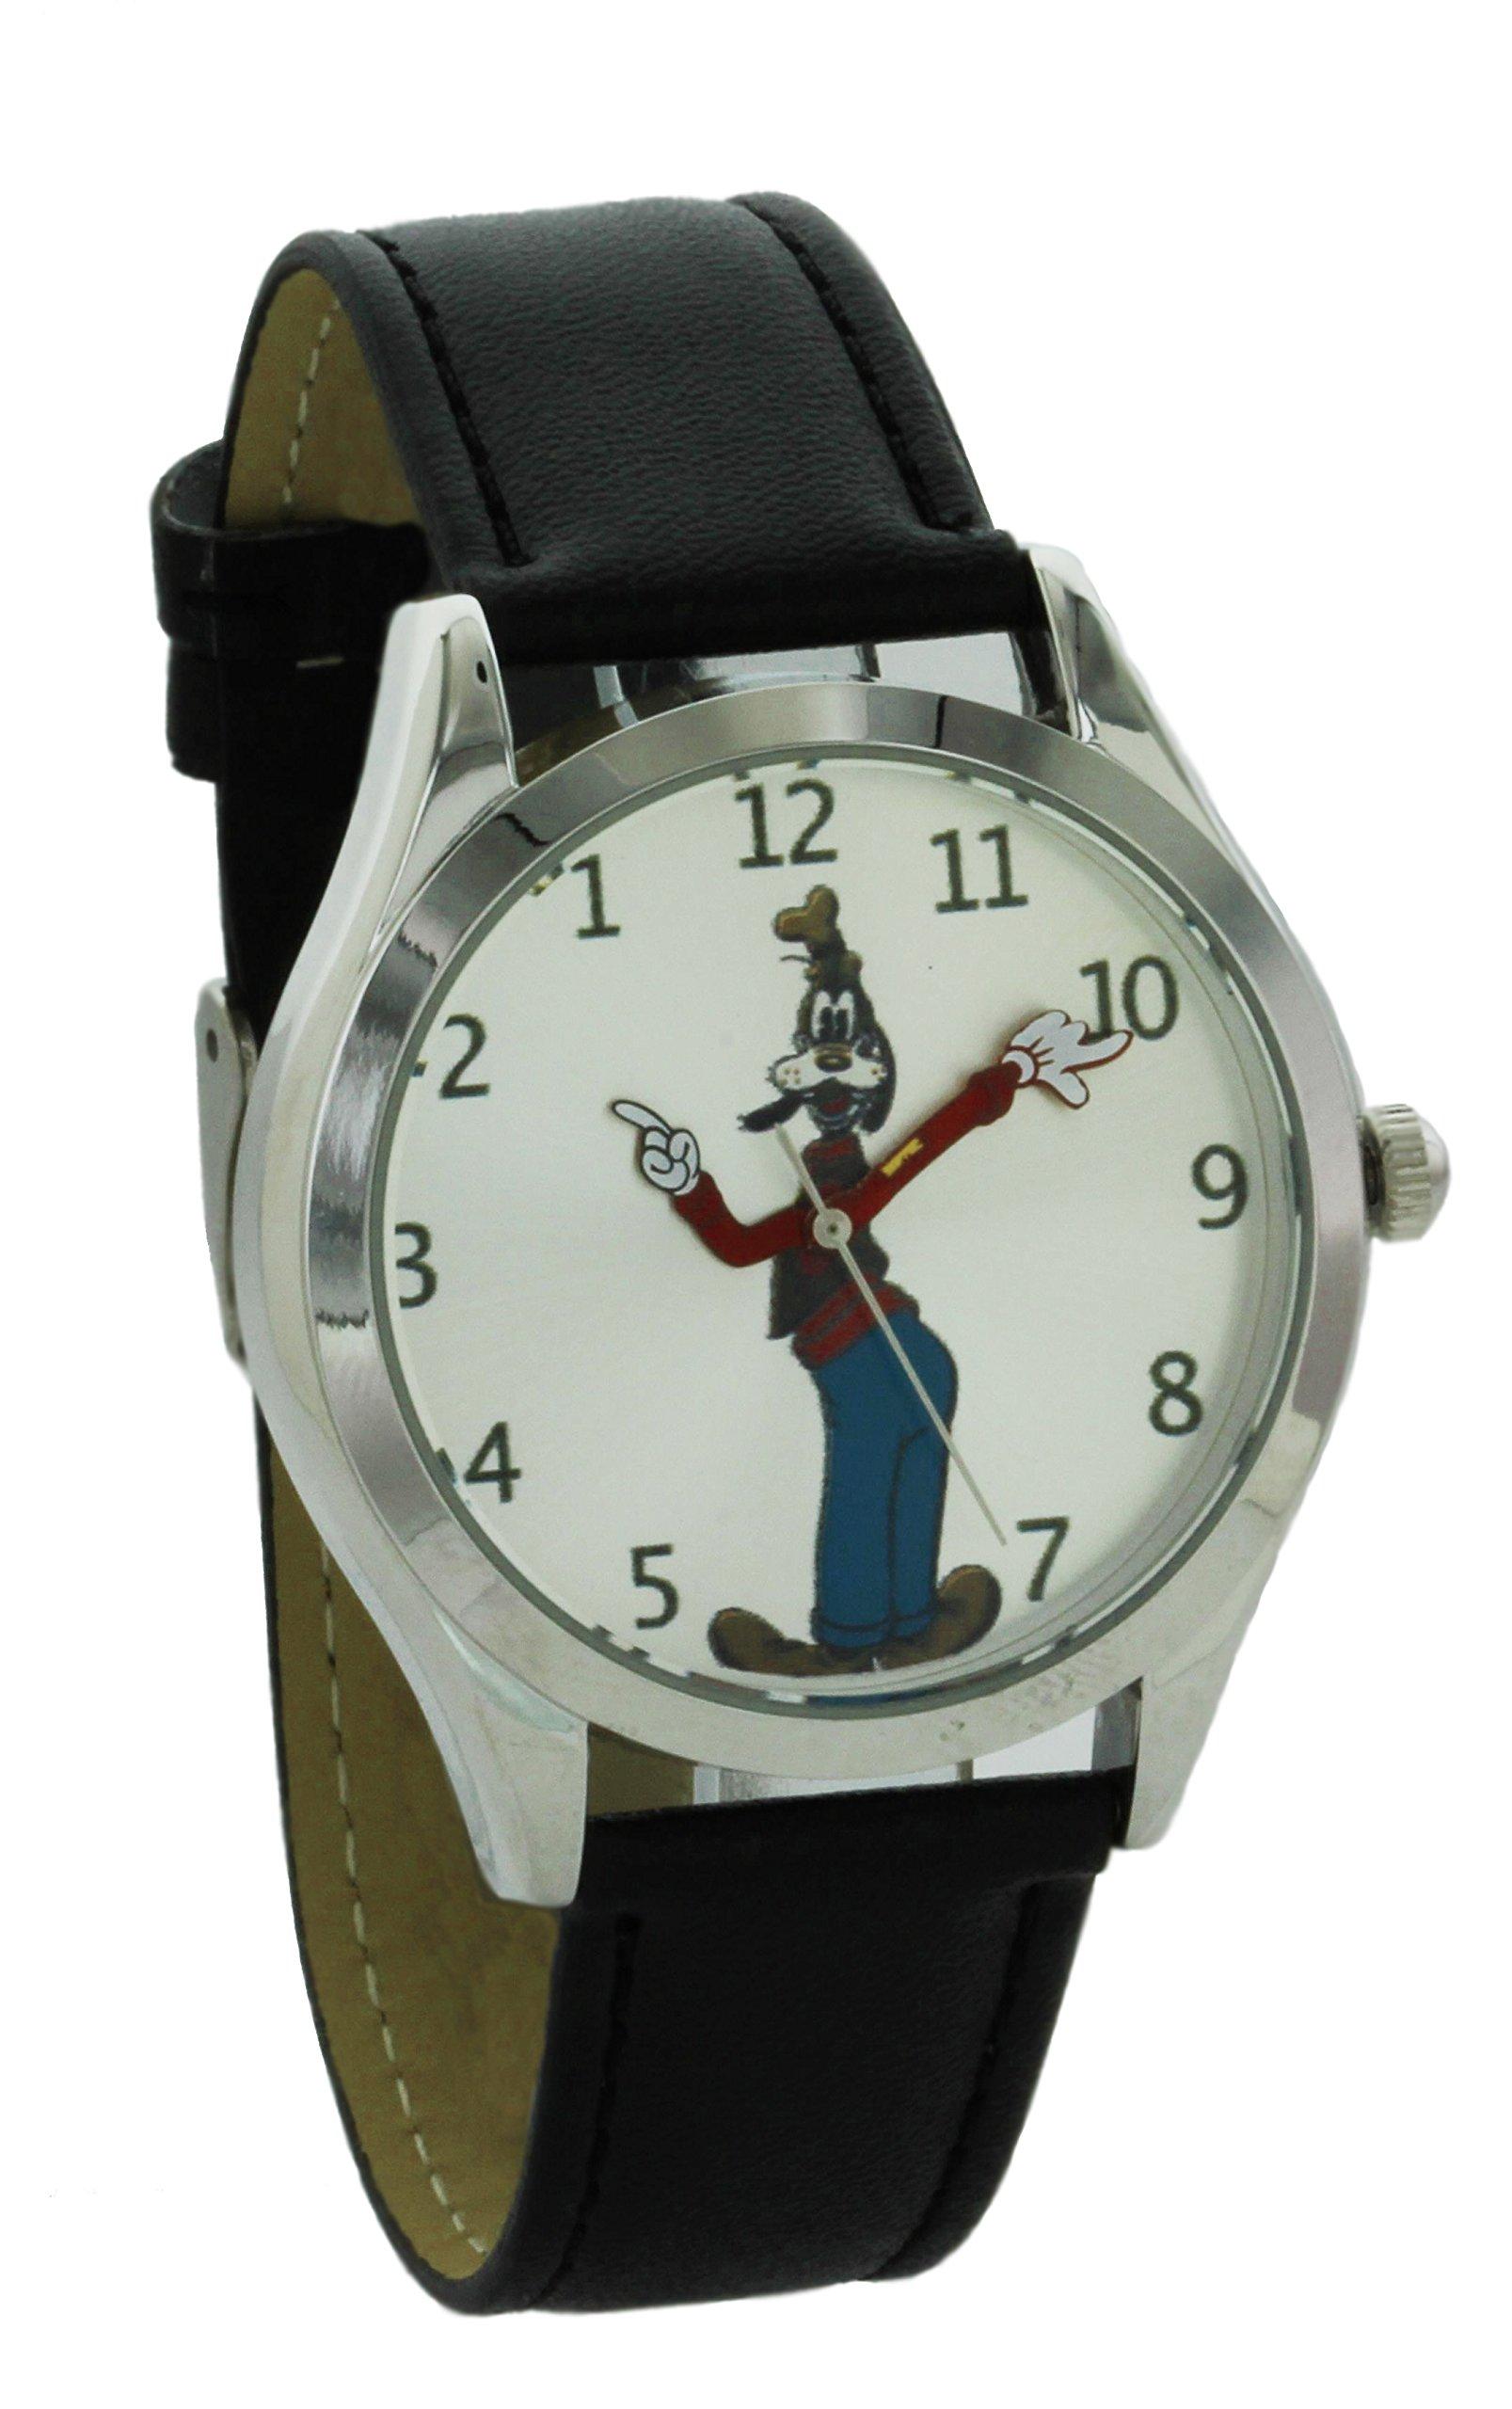 Disney Vintage style backward ticking watch Goofy Molded Hand Quartz watch GFY001